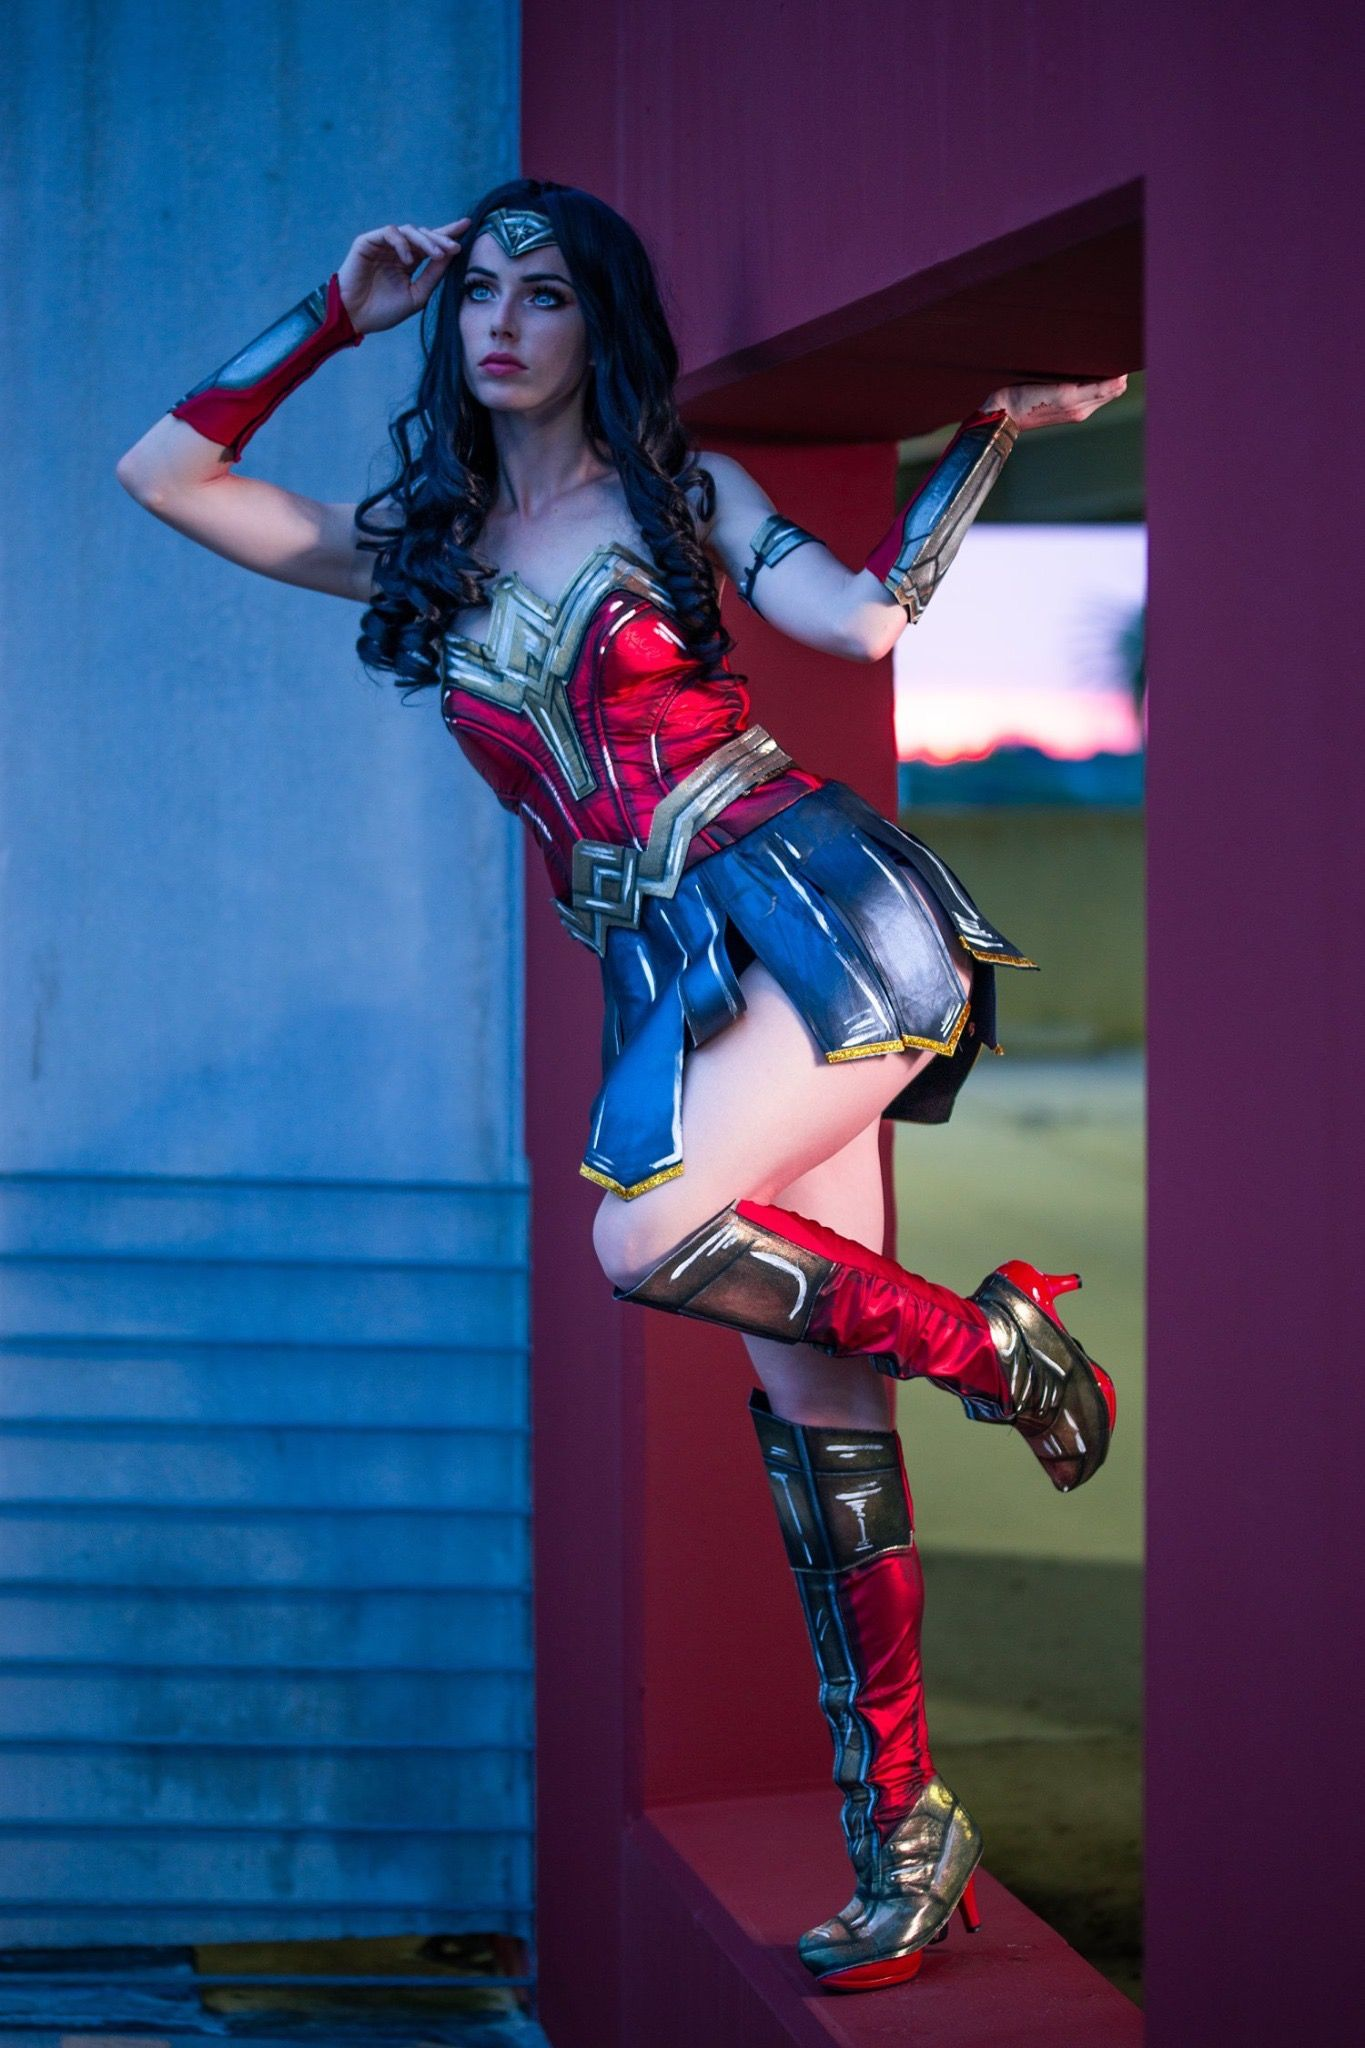 Megan Coffey   Wonder woman, Best cosplay, Megan coffey